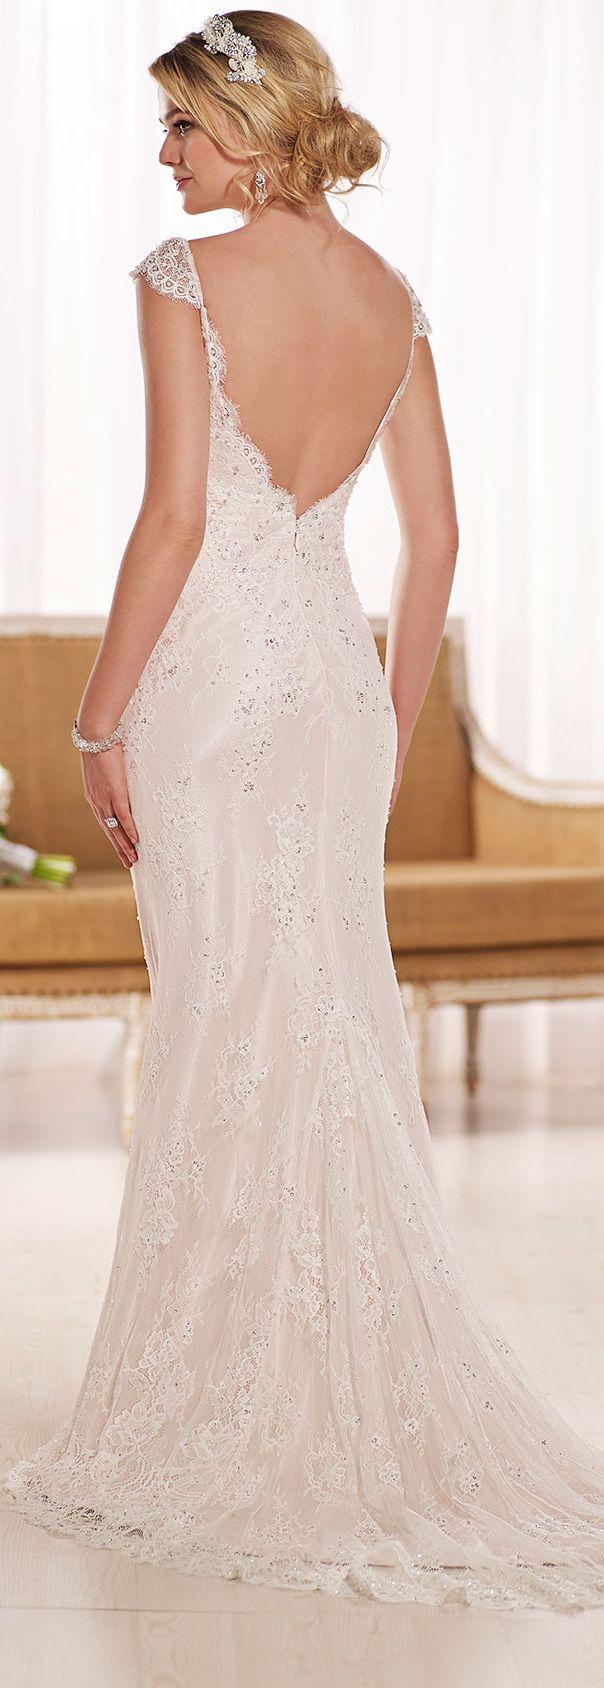 Elegant wedding dress ladies!!!